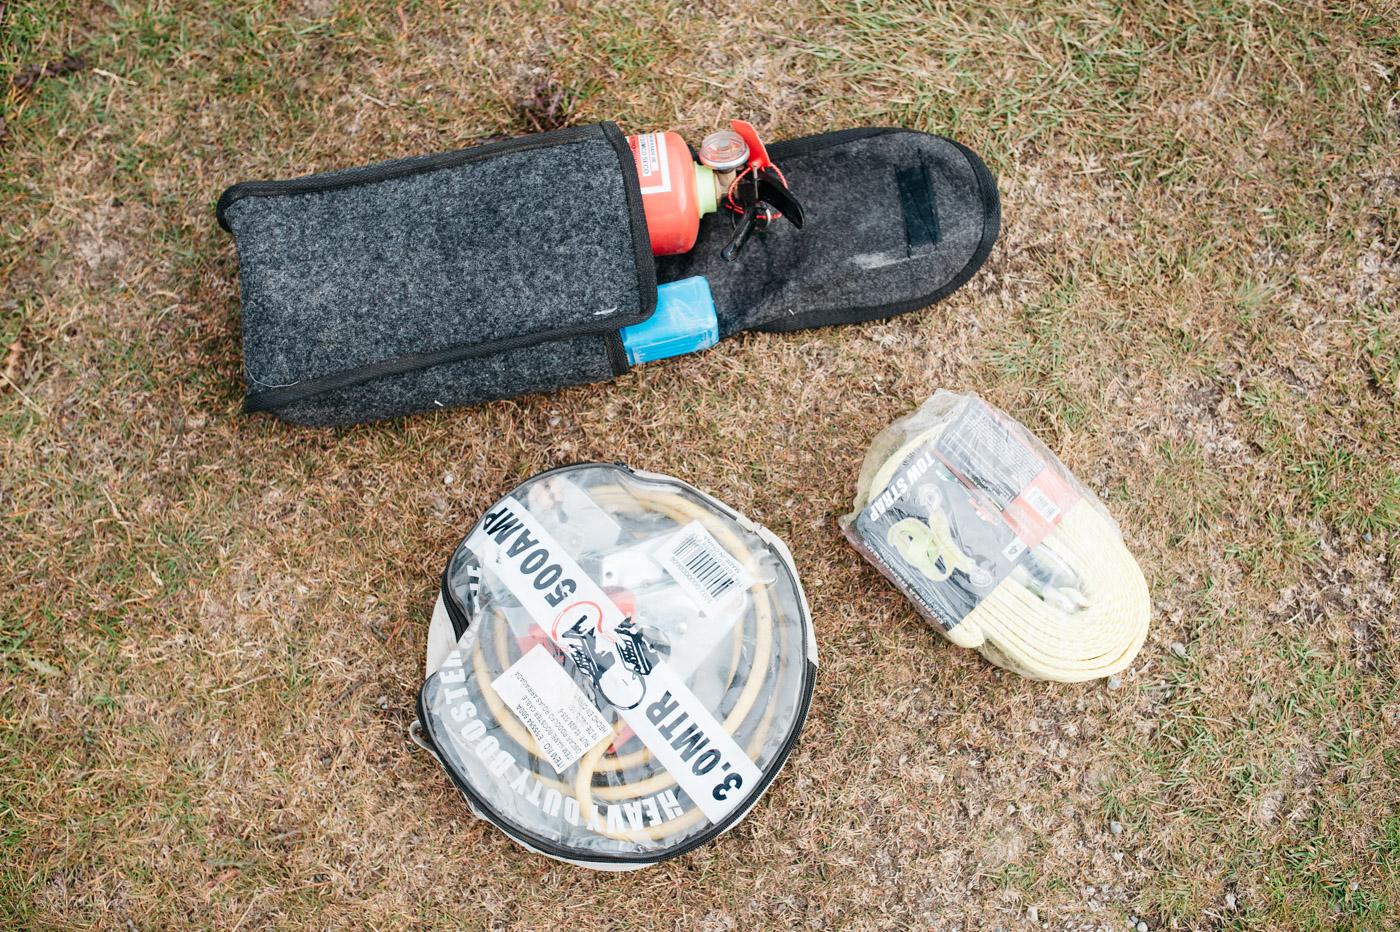 Wicked SouthAmerica Campervan Review-emergency kit